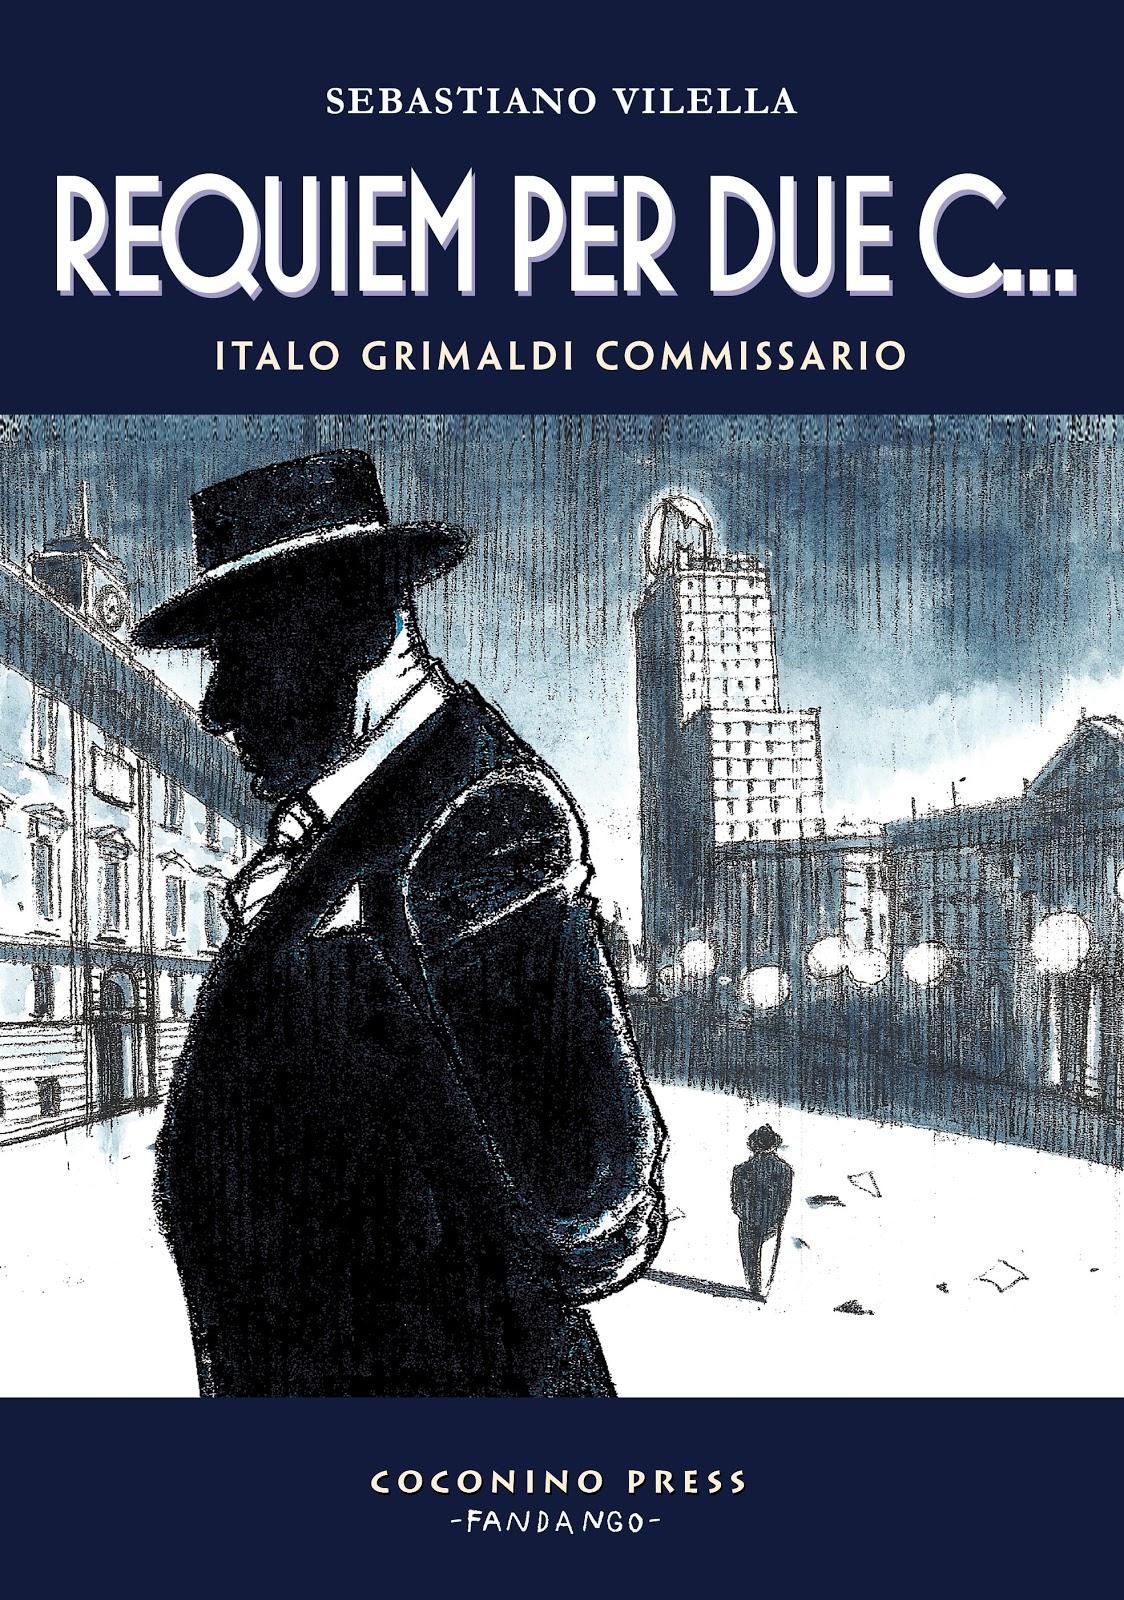 Sebastiano Vilella - Requiem per due c... - Italo Grimaldi commissario